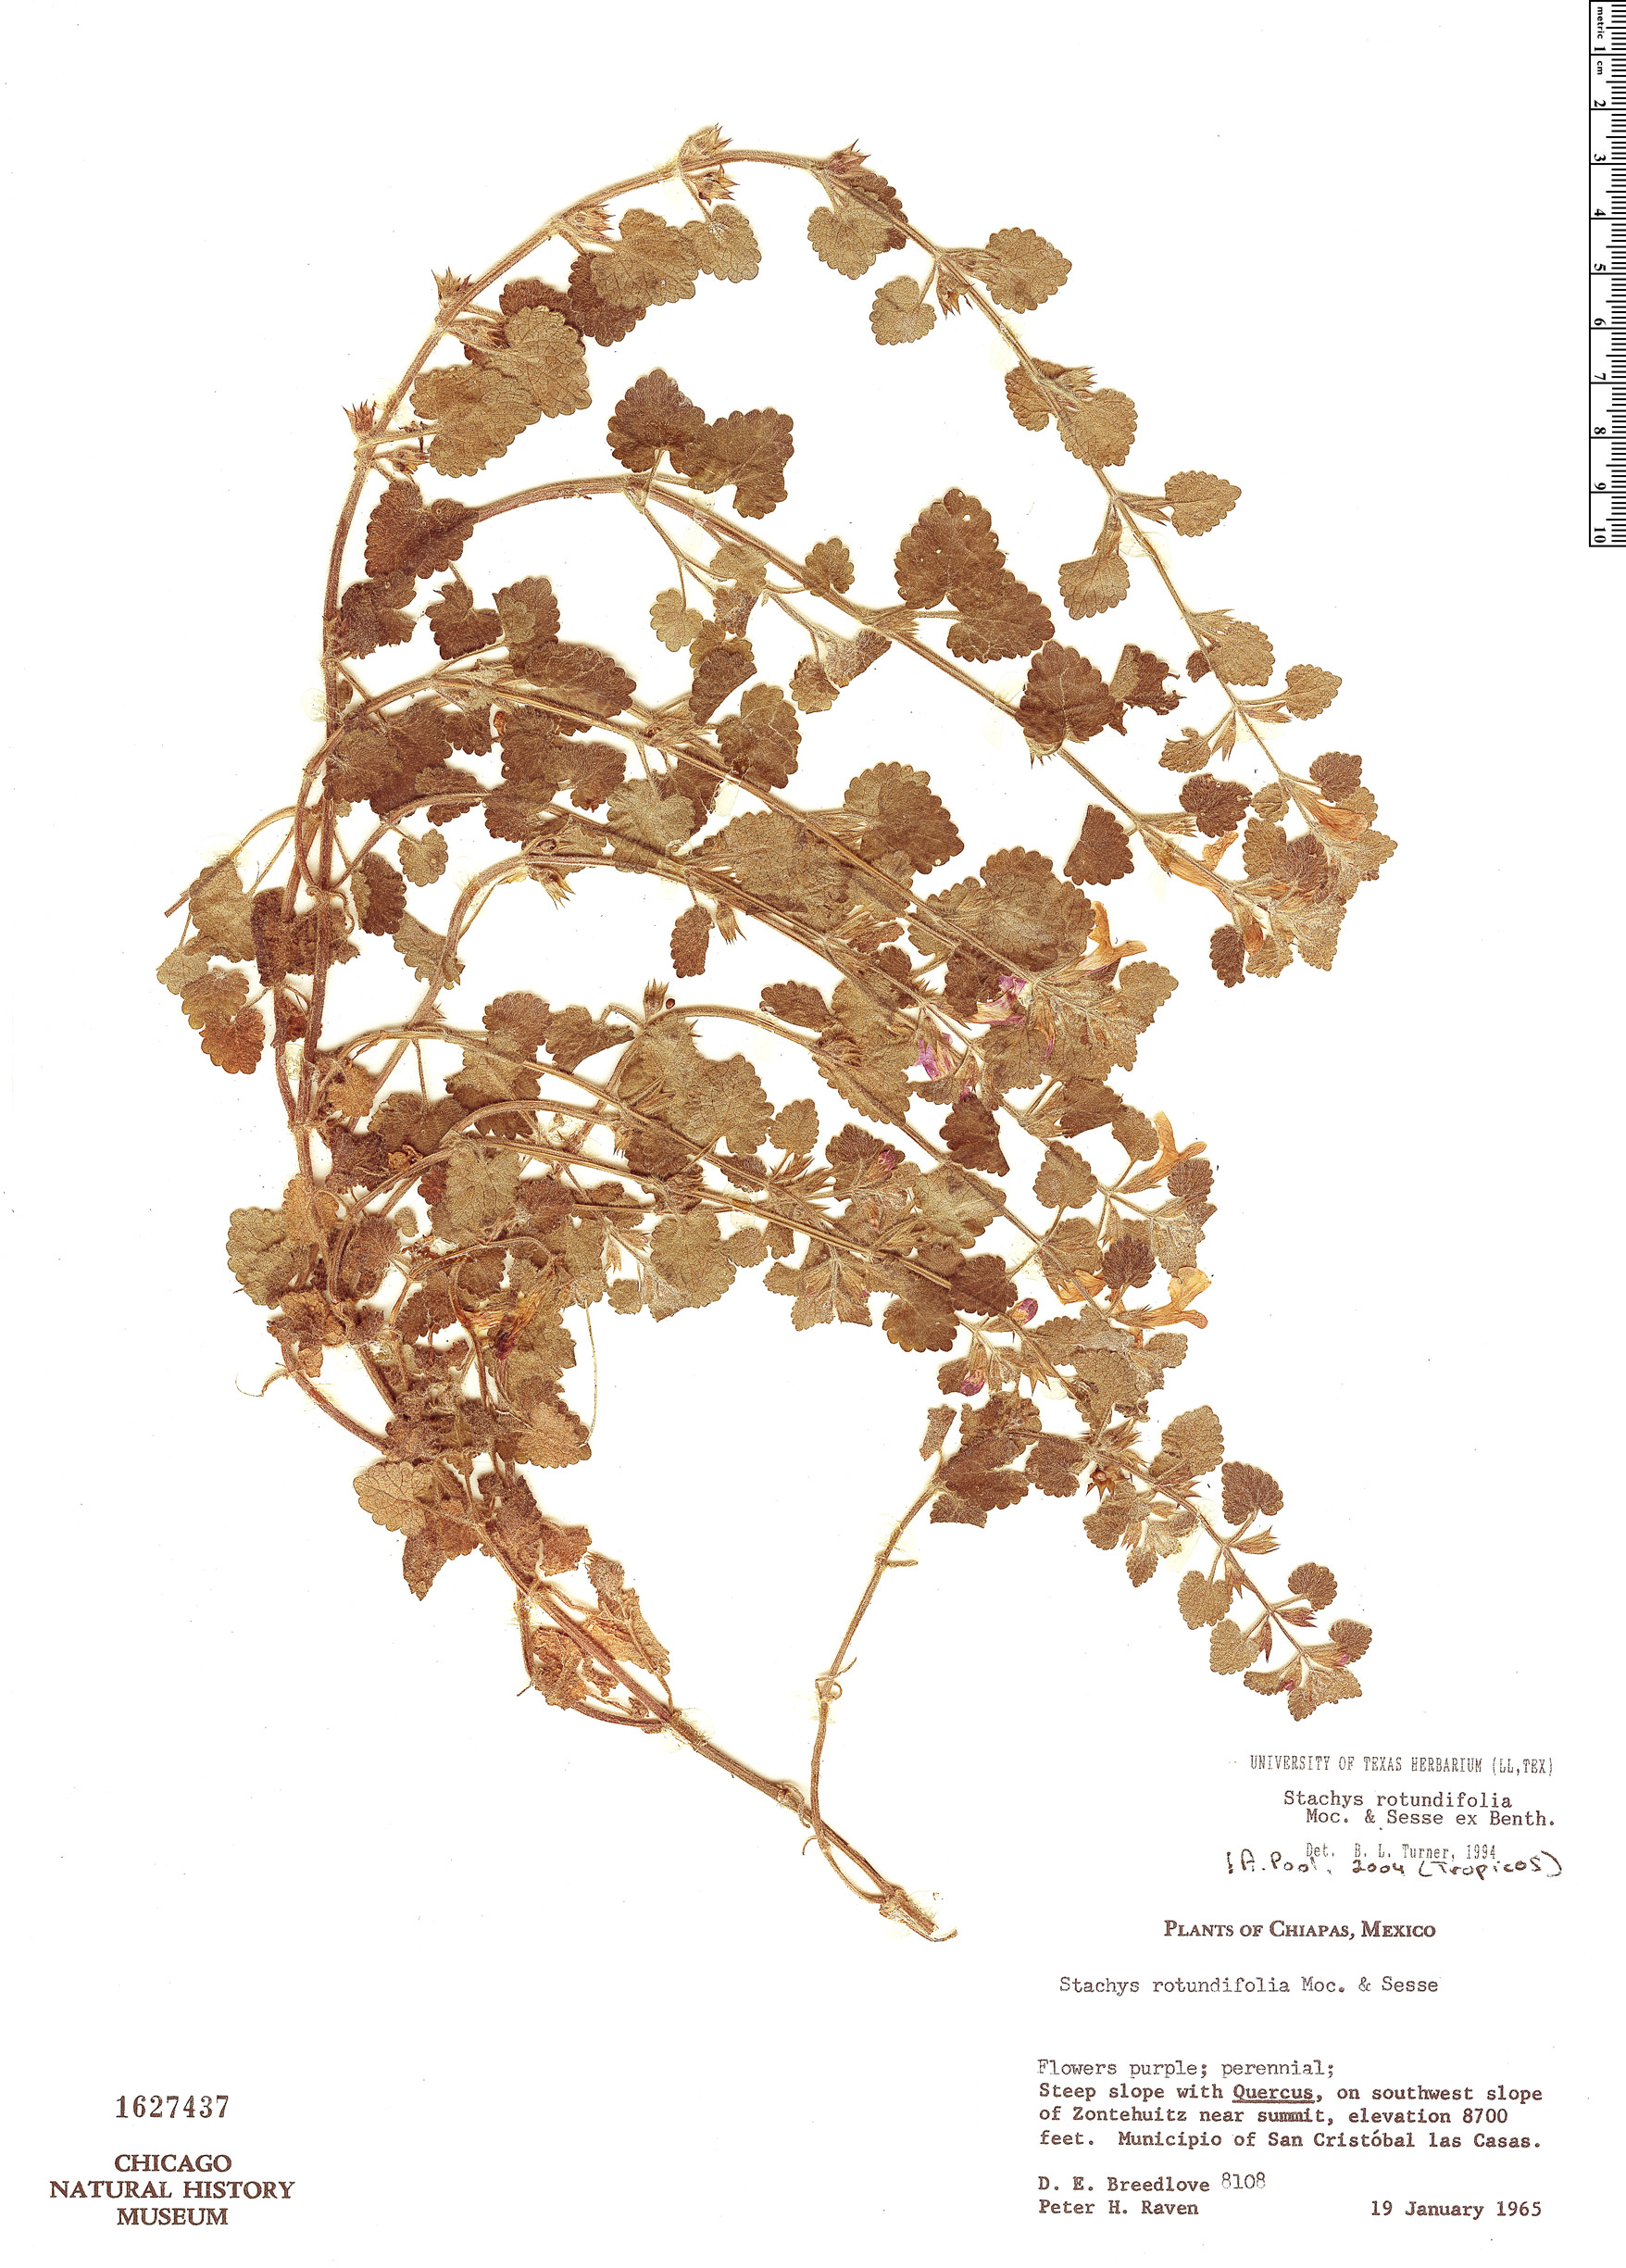 Specimen: Stachys rotundifolia